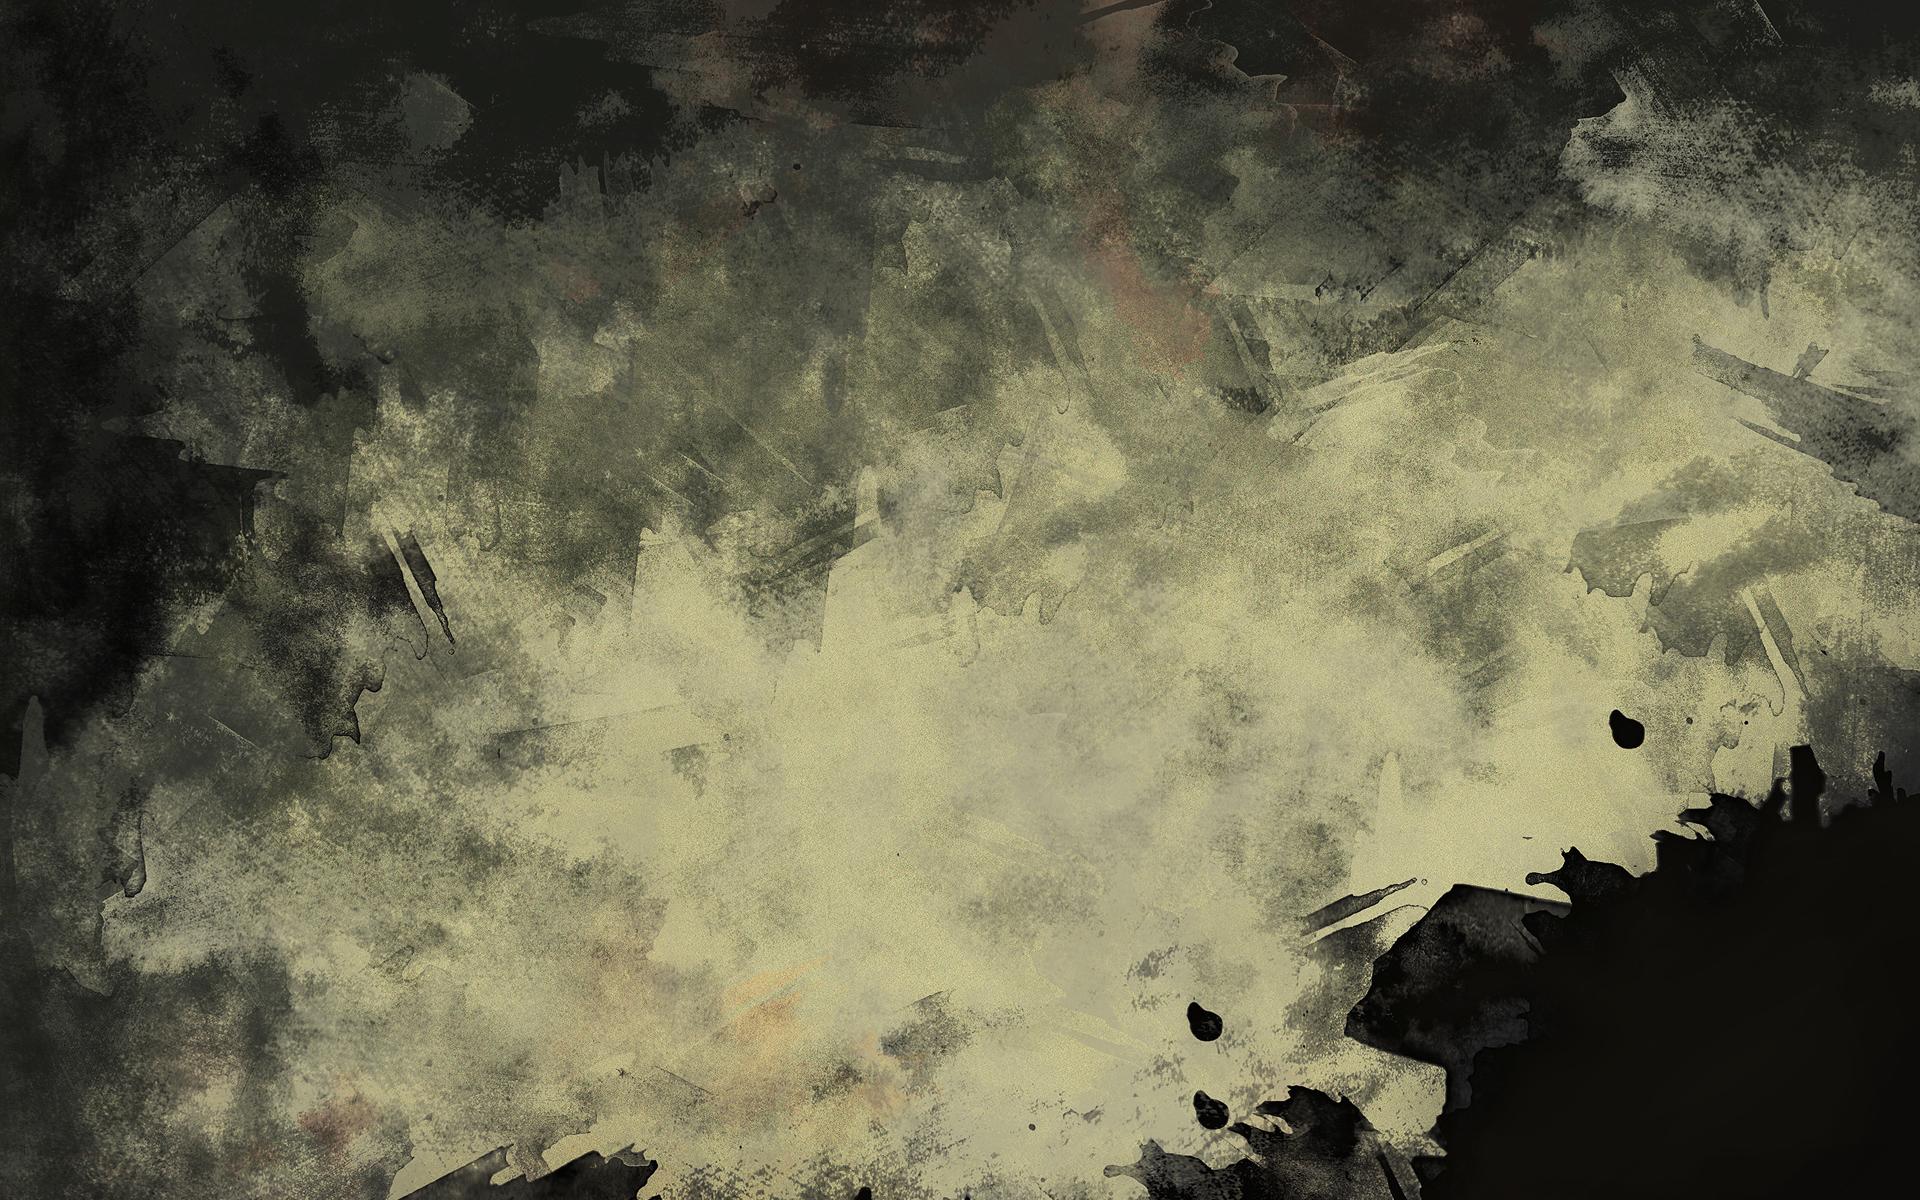 Grunge wallpaper   232155 1920x1200